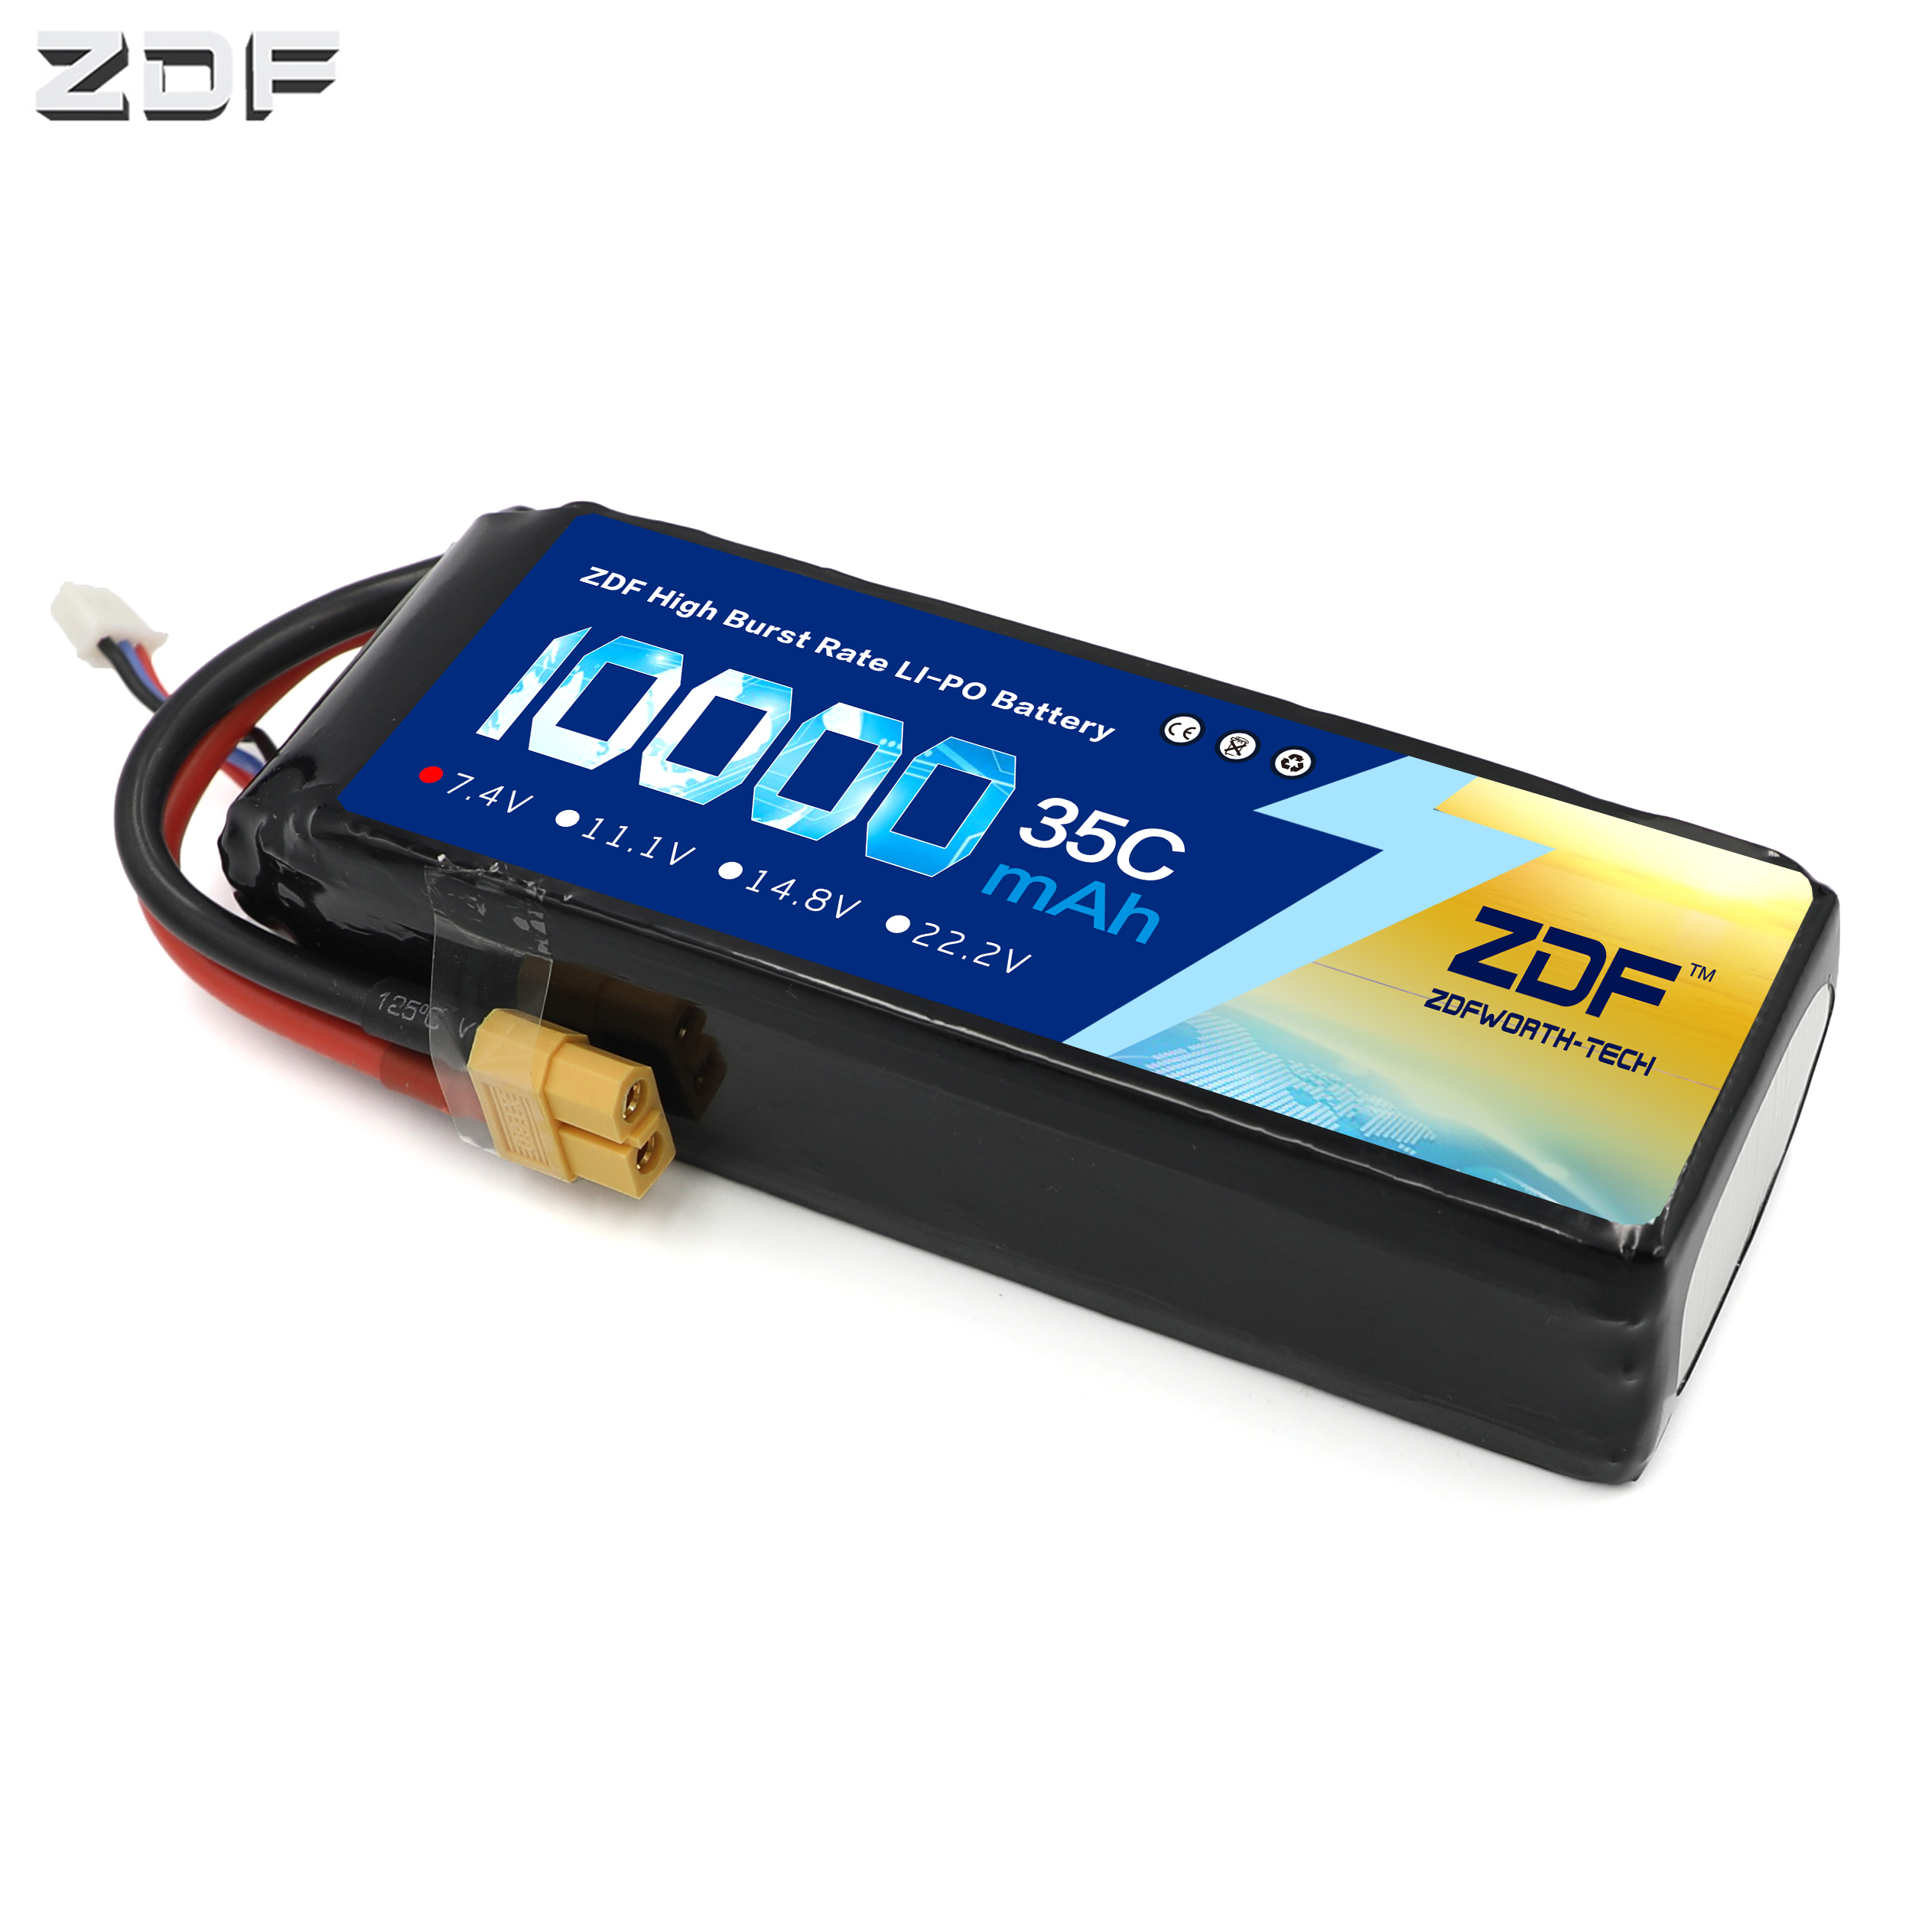 ZDF RC Car Lipo Battery 2S 3S 7 4V 11 1V 10000mah 35C Max 70C XT90